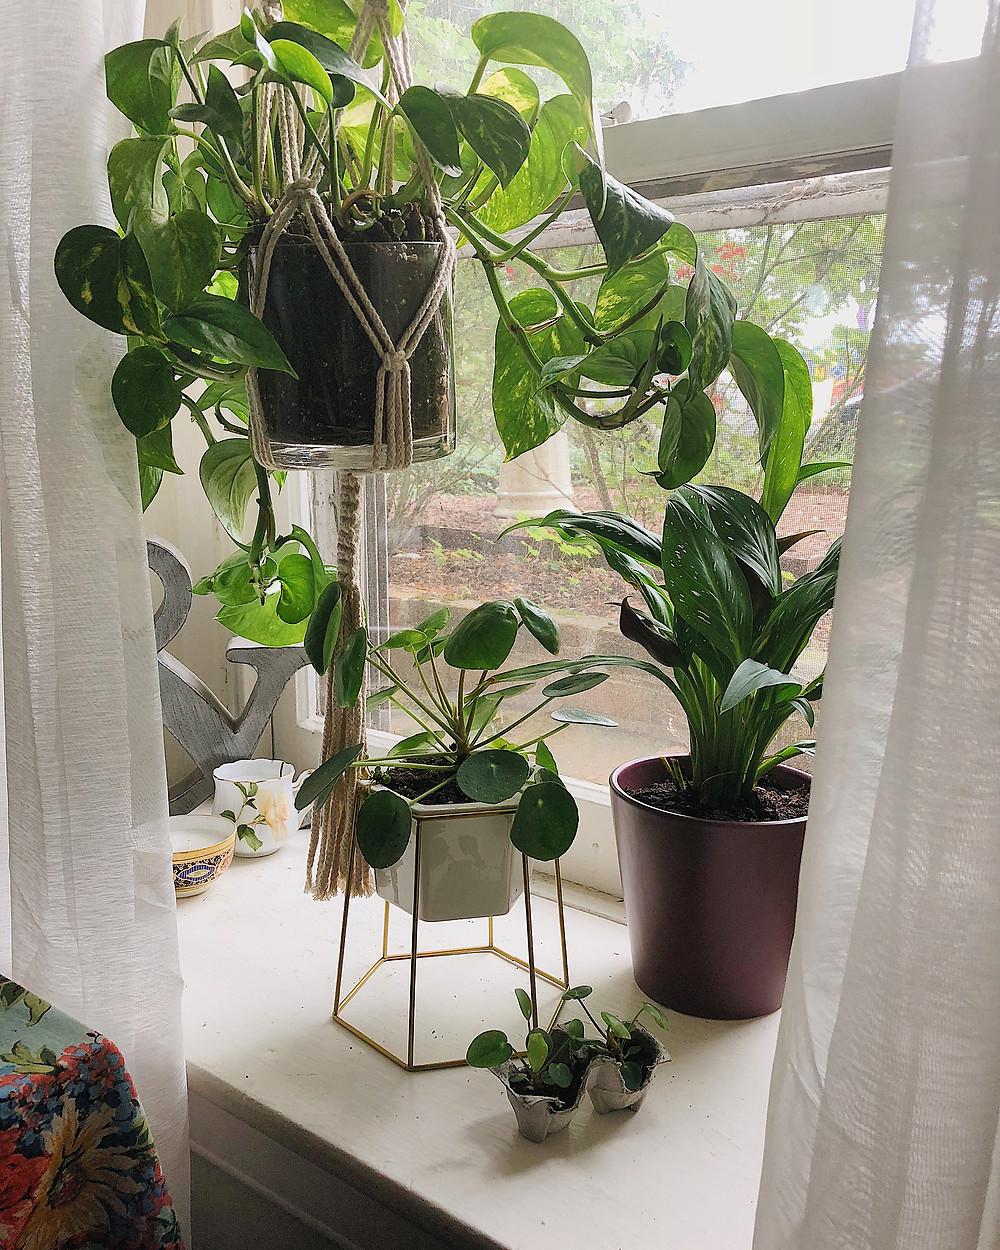 hanging plants in windowsill